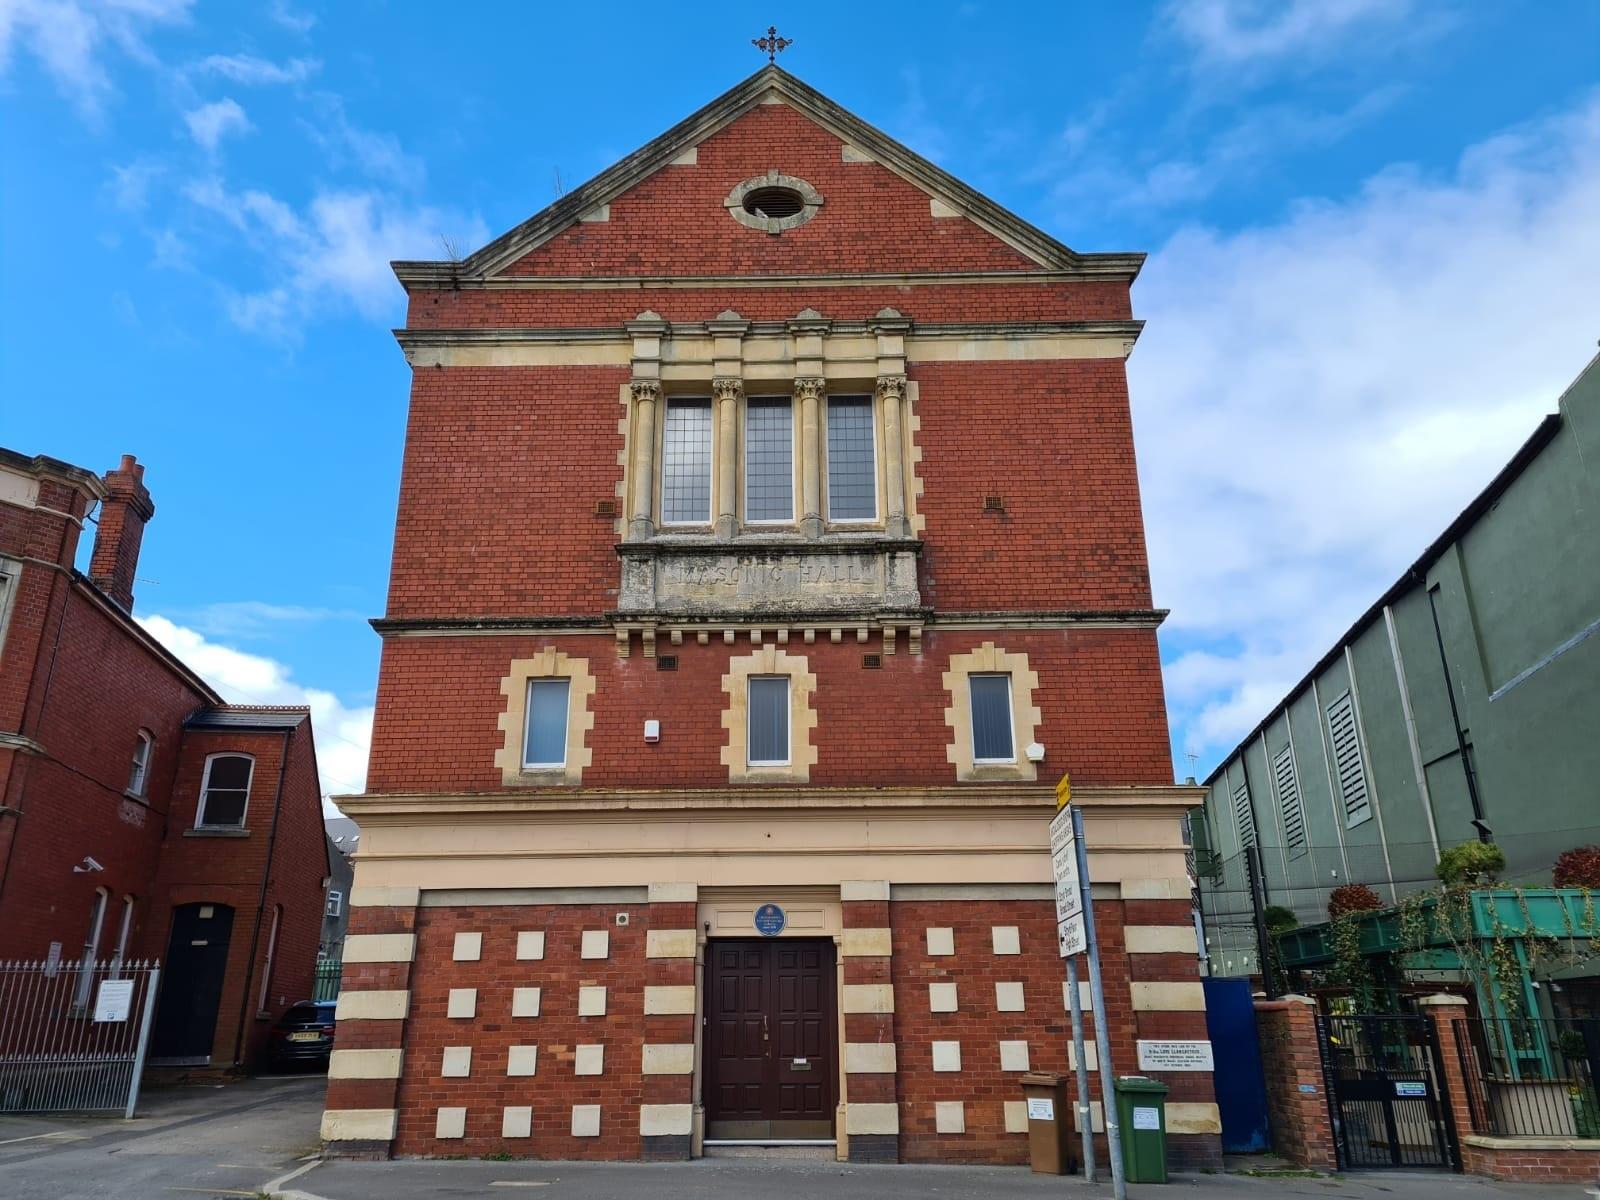 Barry Masonic Hall